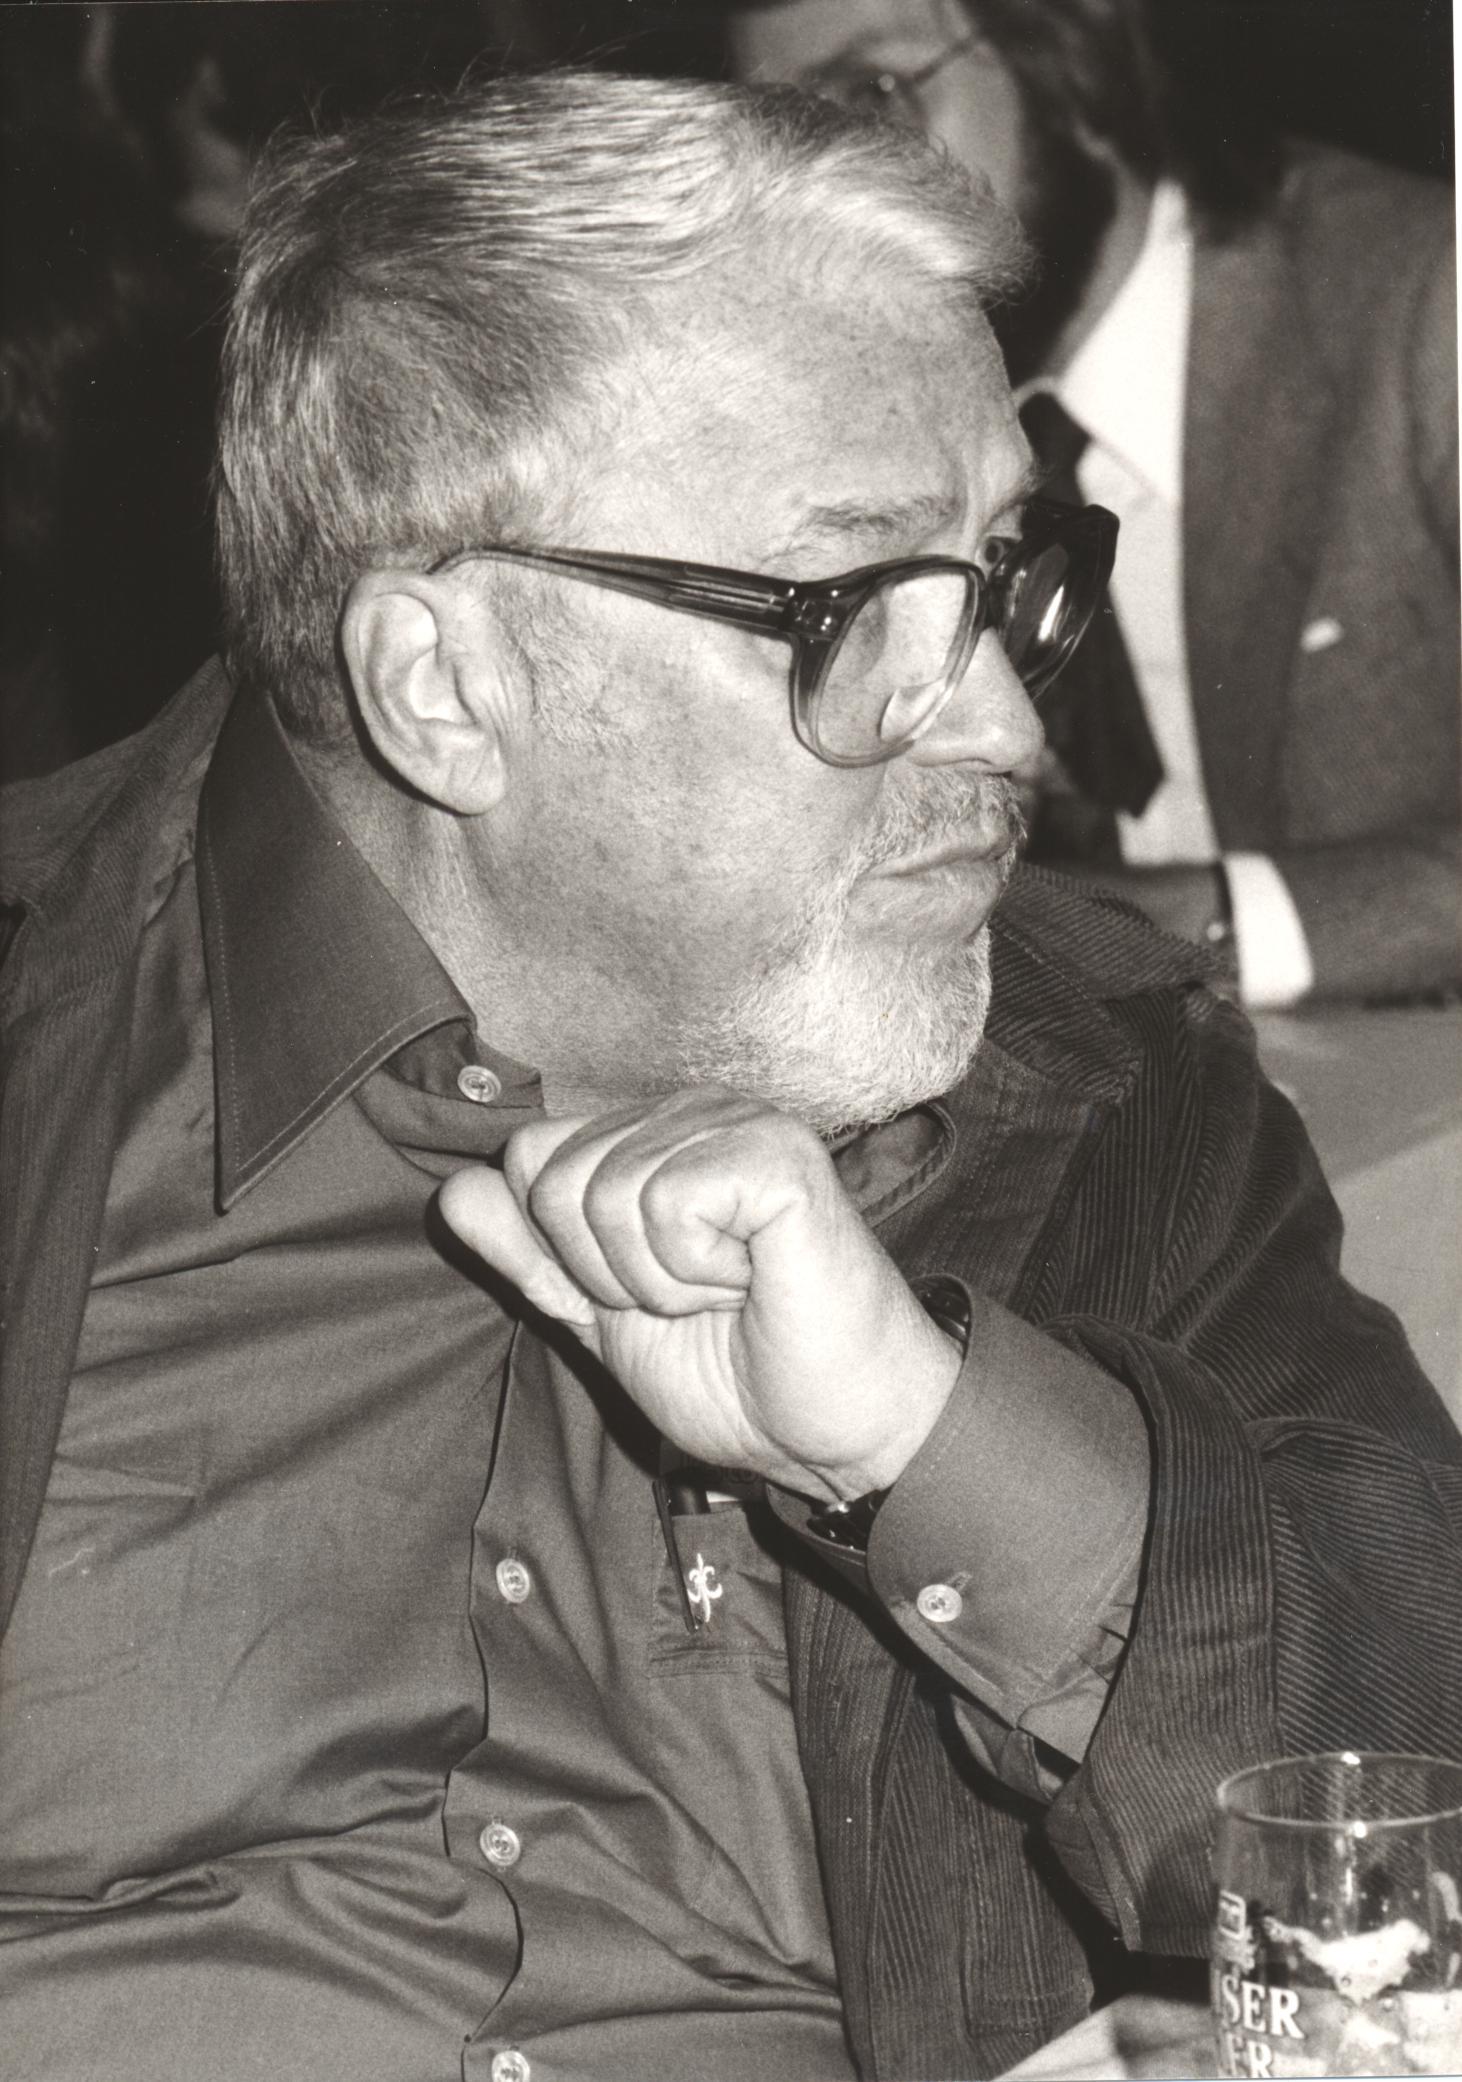 XIII. Imago Mundi-Kongress 1991, Innsbruck, Regisseur Rolf Olsen